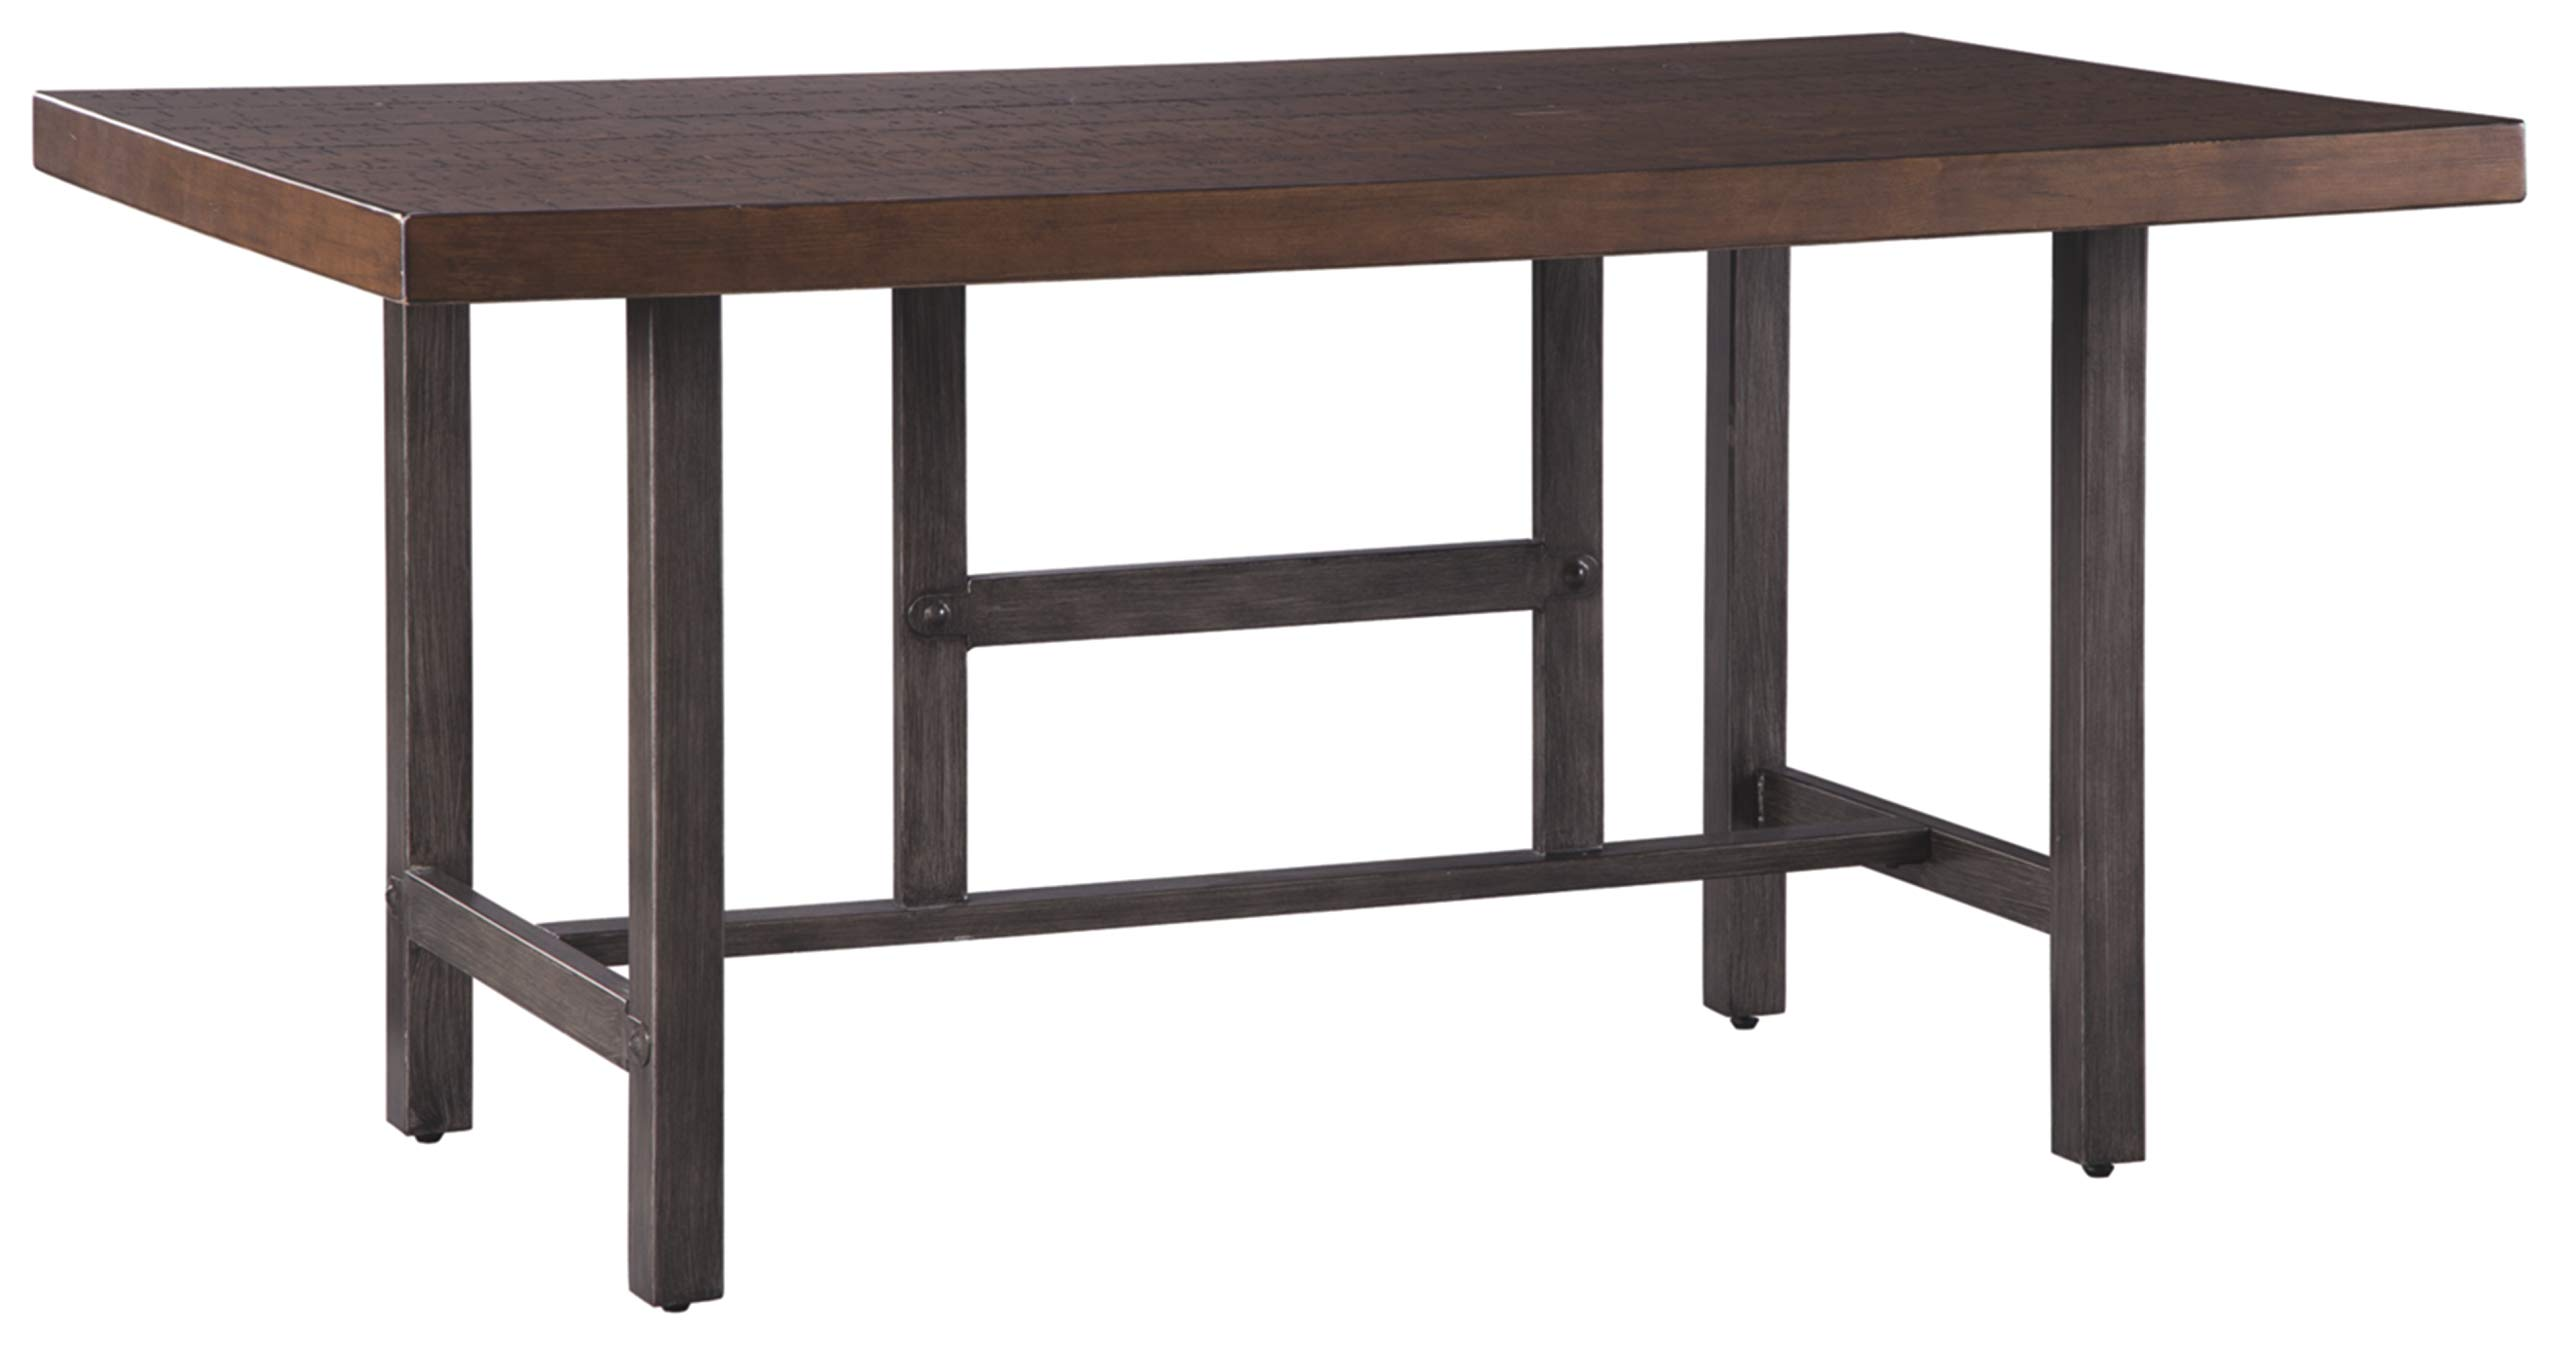 Signature Design by Ashley Kavara Dining Tables, 36.00'' W x 60.00'' D x 30.00'' H, Medium Brown by Signature Design by Ashley